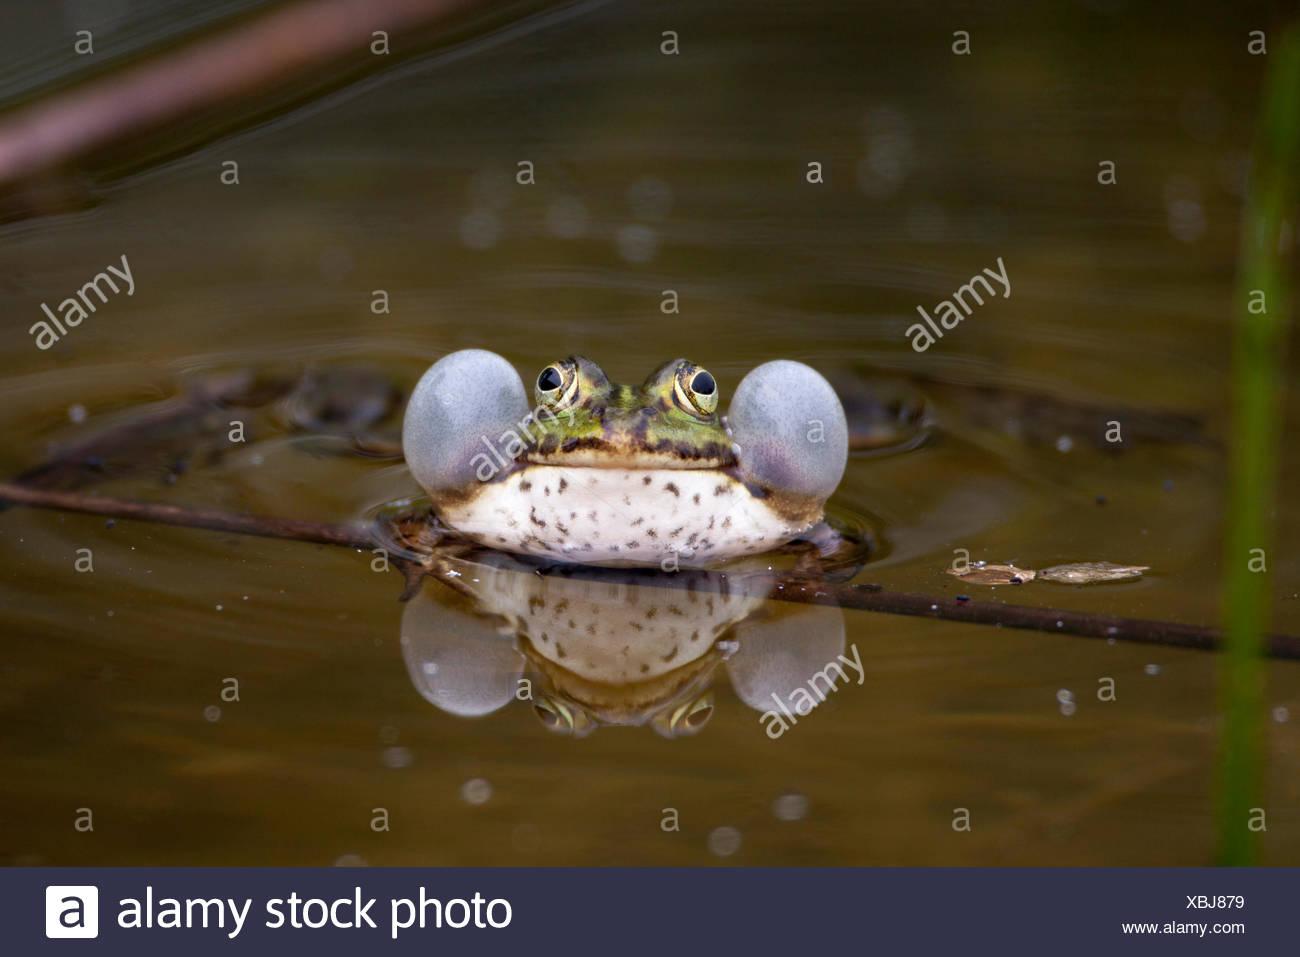 Frog, edible frog, common frog or green frog (Rana esculenta), with vocal sacs, Kirchheim unter Teck, Baden-Württemberg - Stock Image